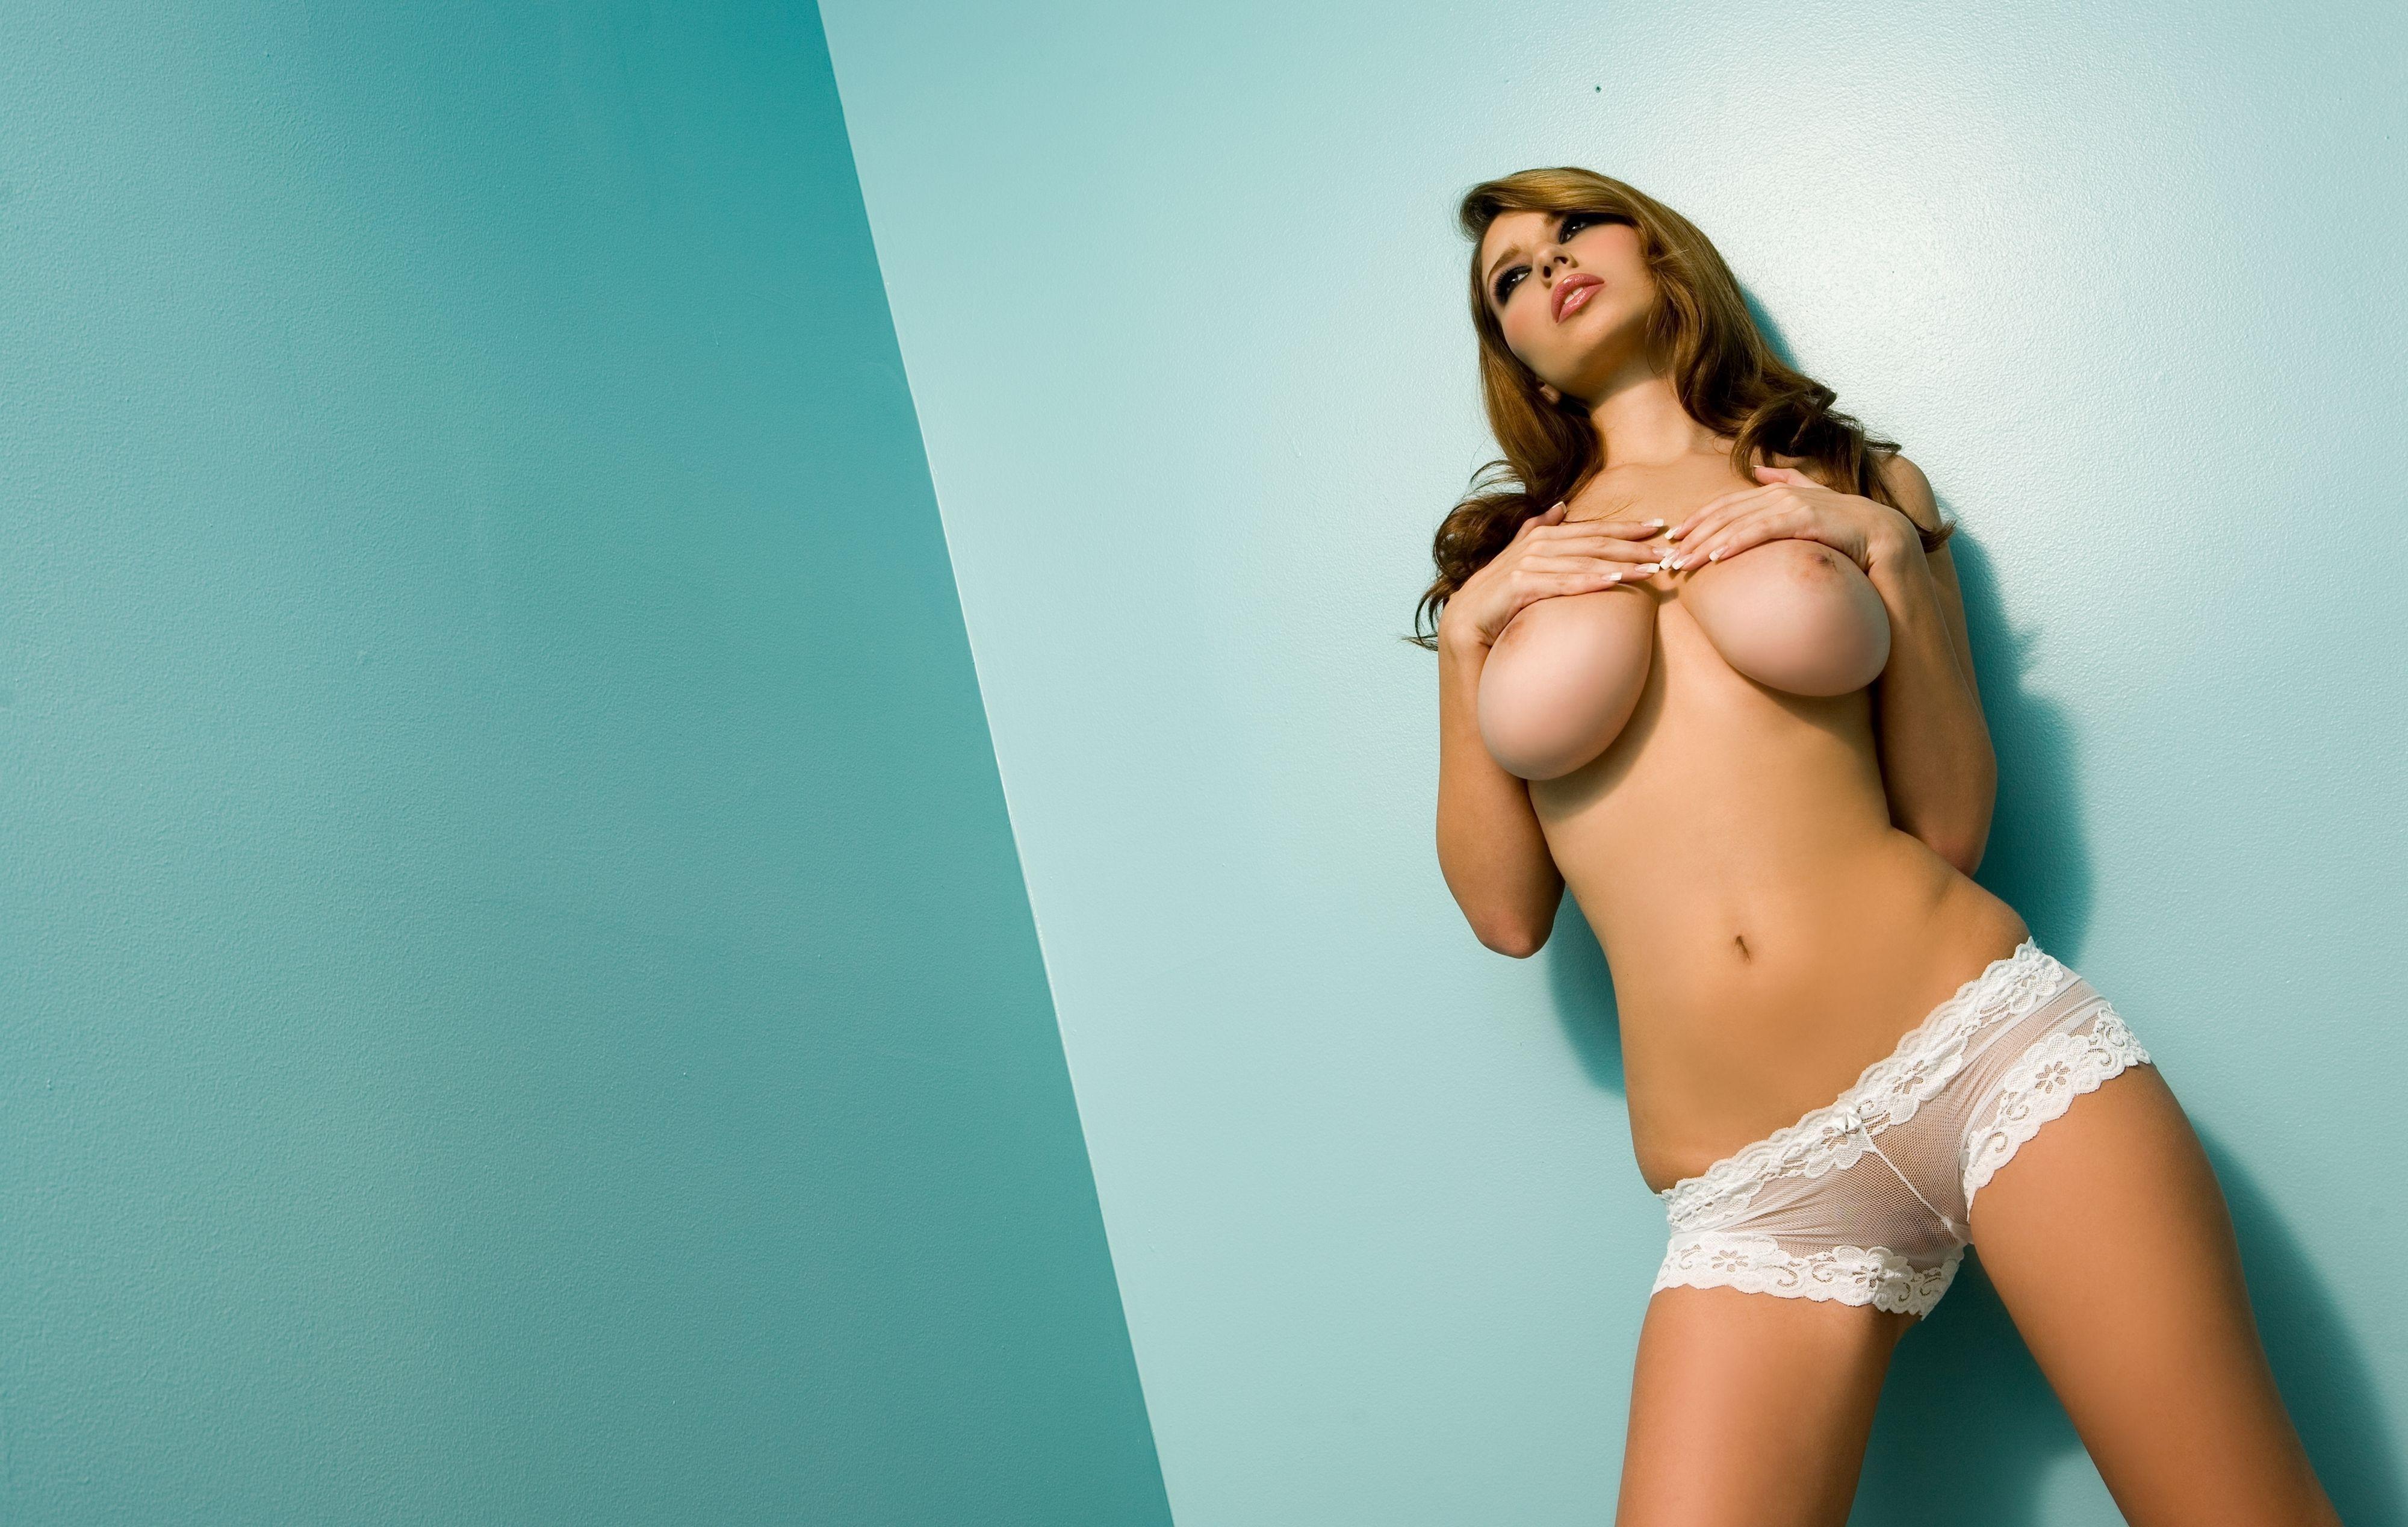 Стоячая грудь онлайн 17 фотография